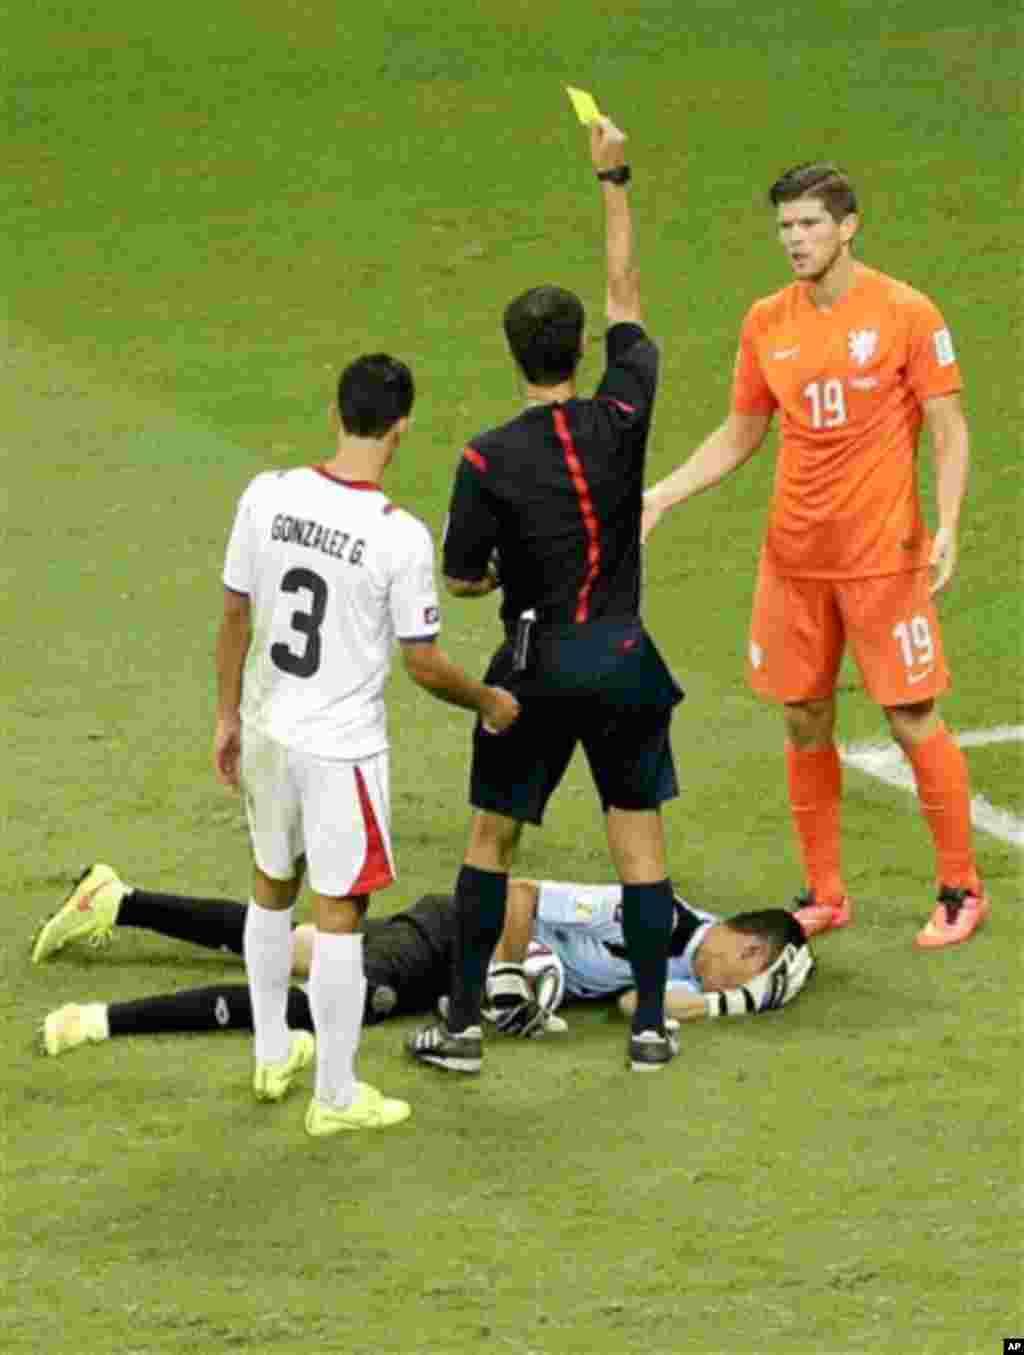 Netherlands' Klaas-Jan Huntelaar gets a yellow card for fouling Costa Rica's goalkeeper Keylor Navas during the World Cup quarterfinal soccer match between the Netherlands and Costa Rica at the Arena Fonte Nova in Salvador, Brazil, Saturday, July 5, 2014.